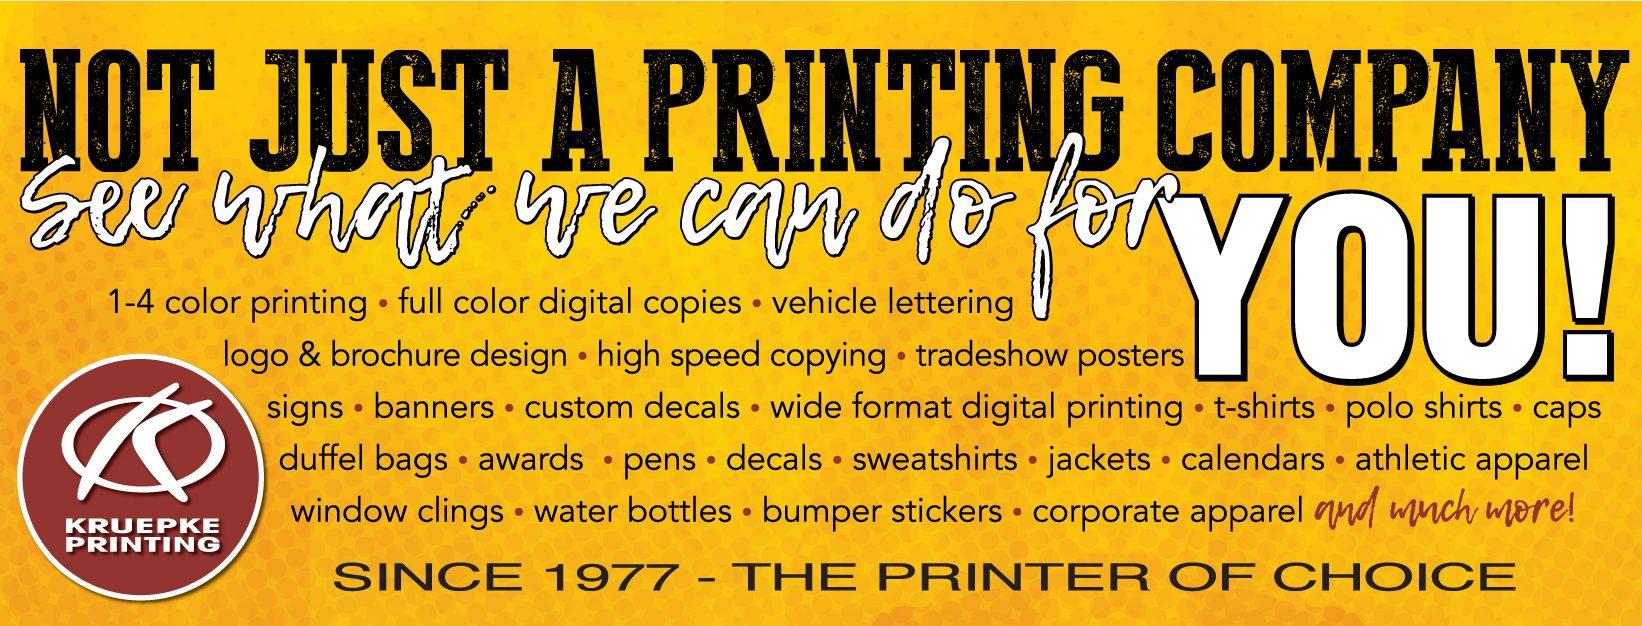 Kruepke Printing